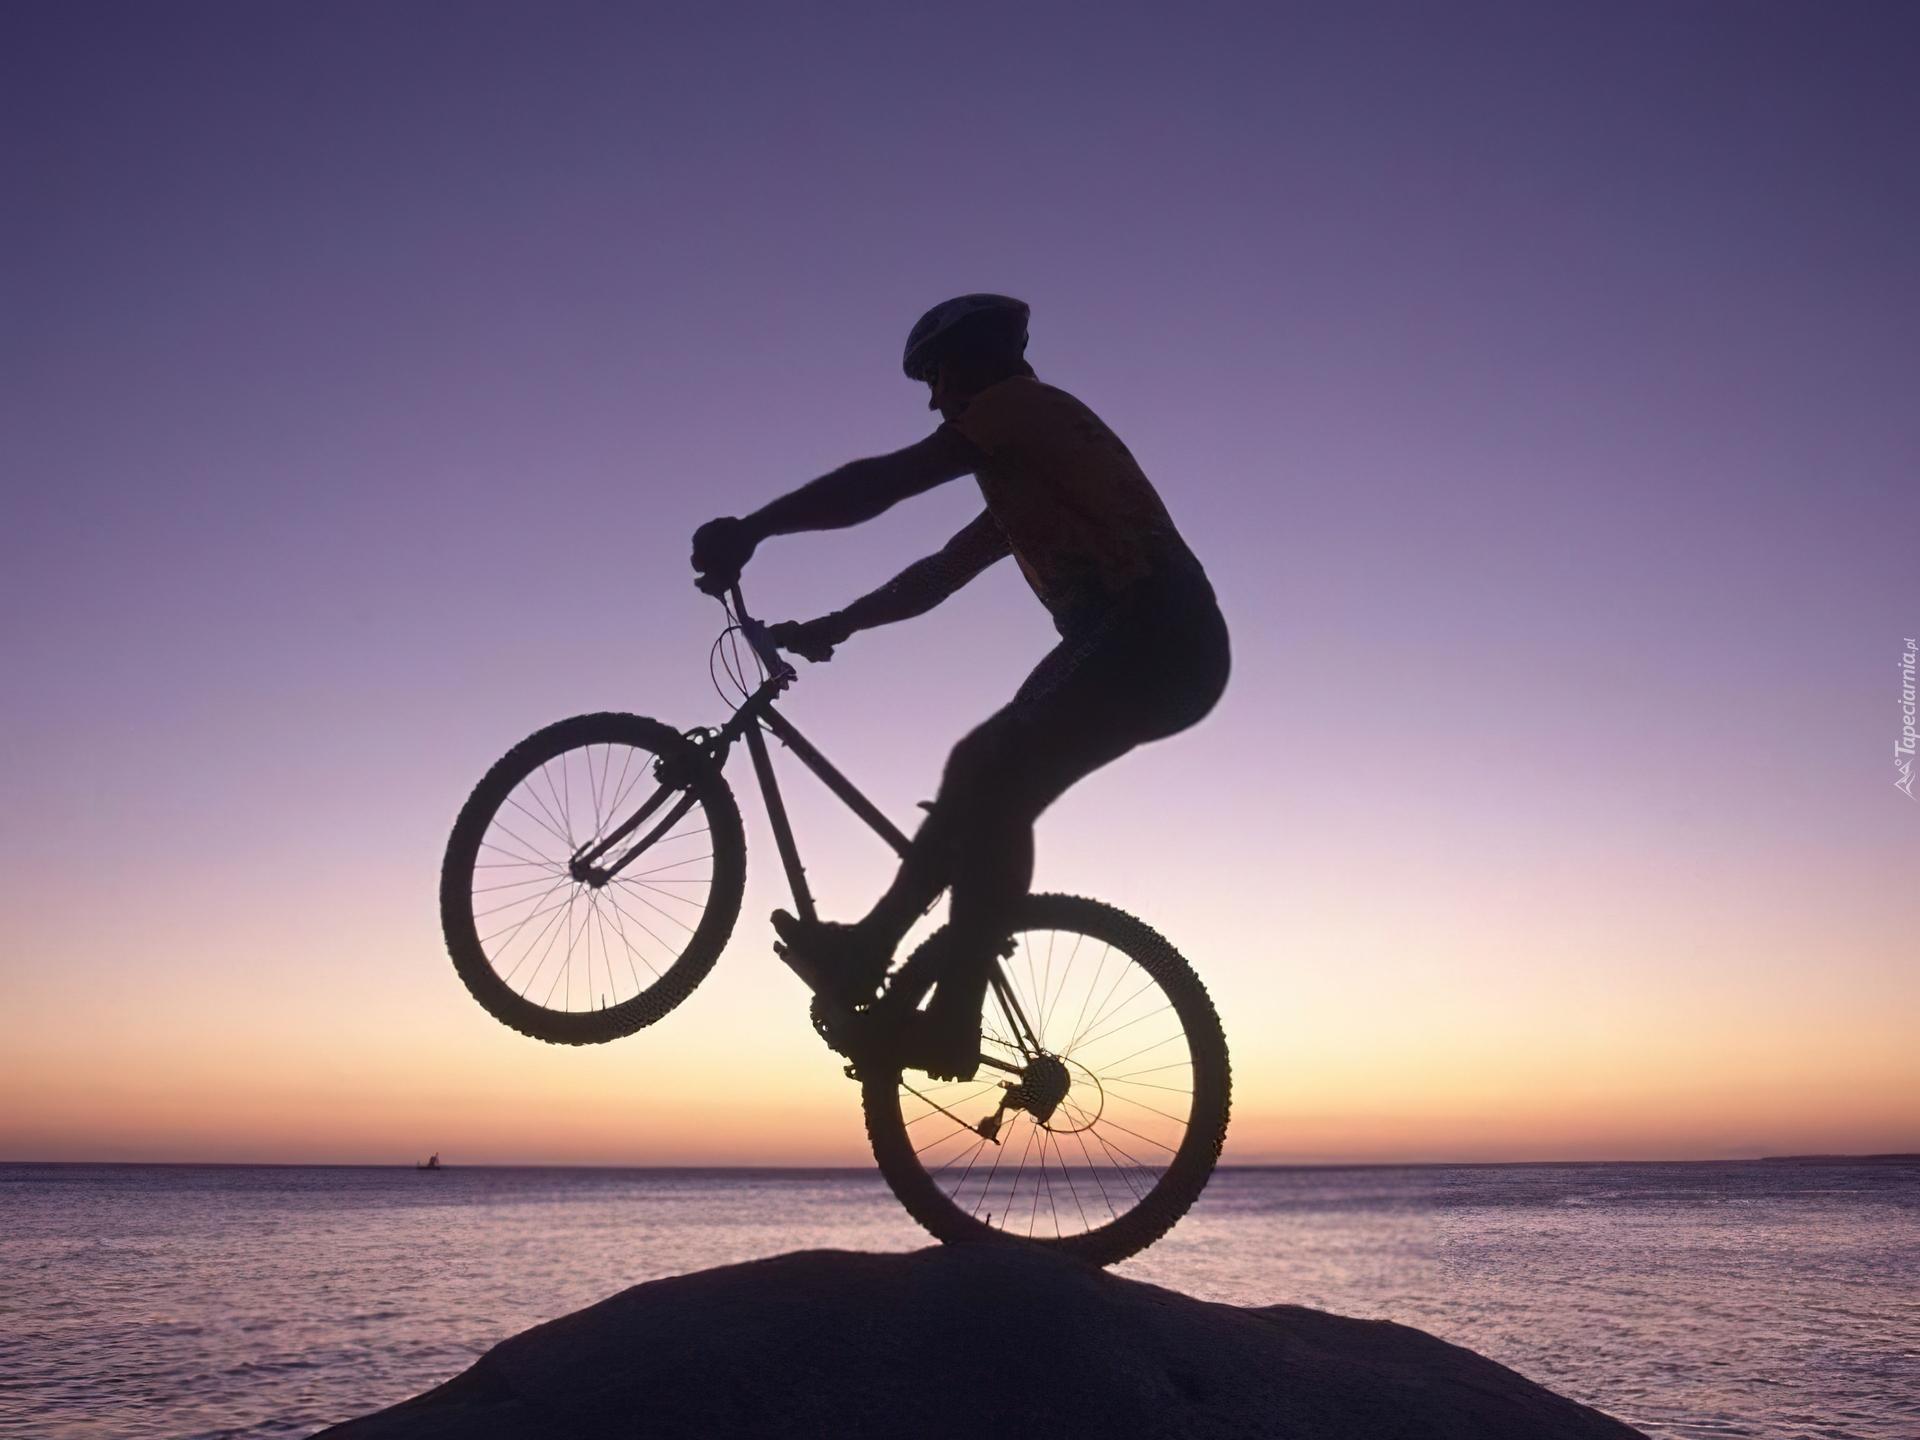 Hd Wallpaper Girl Bike Rower Koło Kierownica Kask Rowerzysta